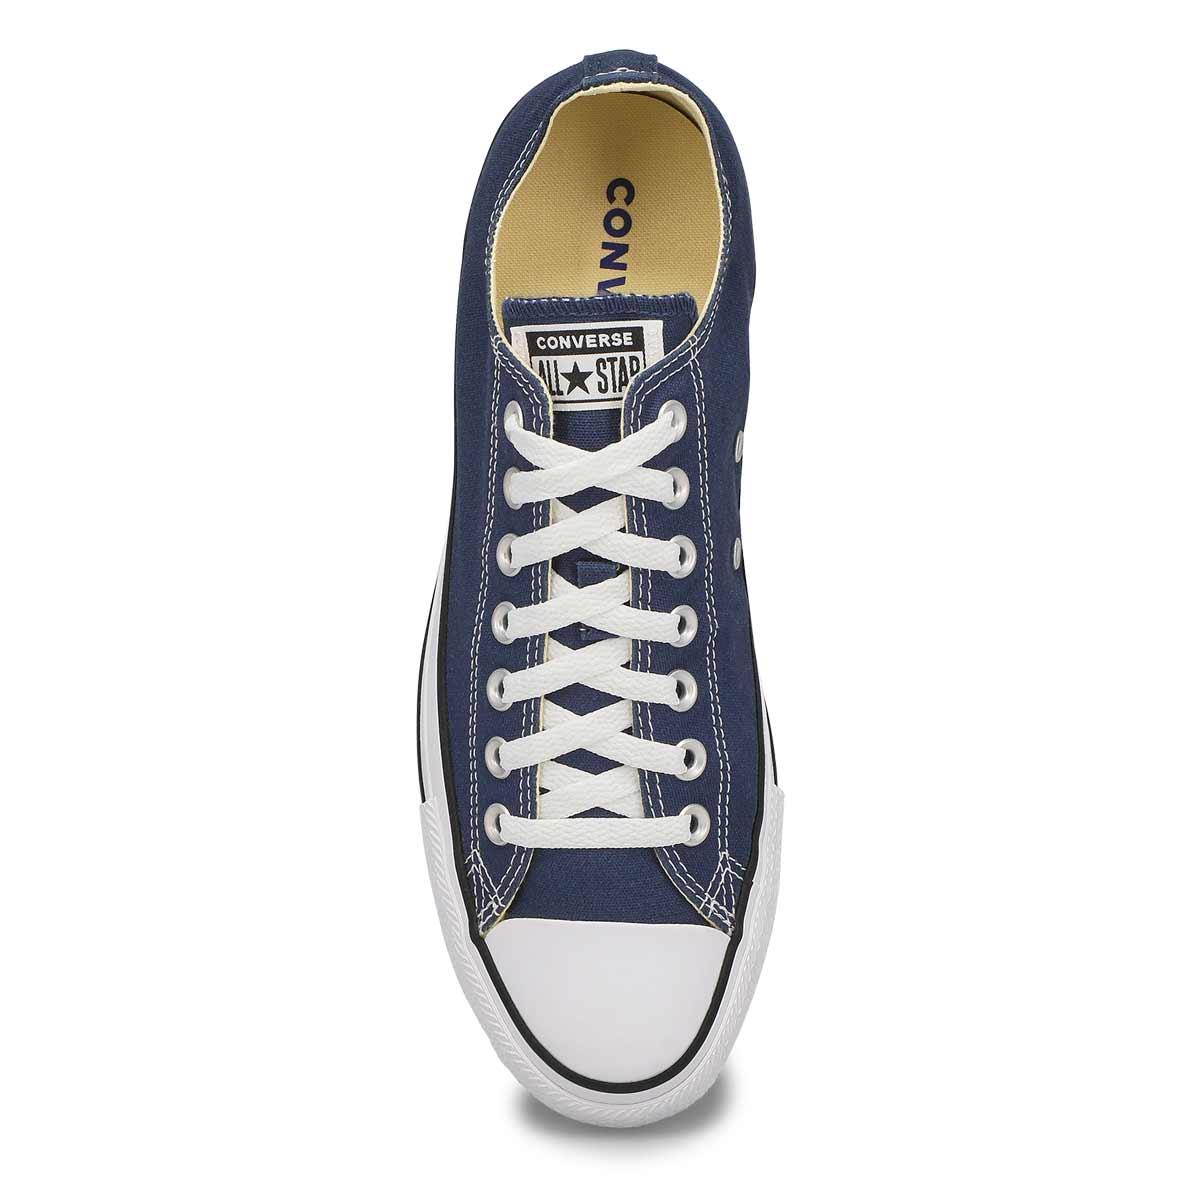 Men's Chuck Taylor All Star Core Sneaker - Navy